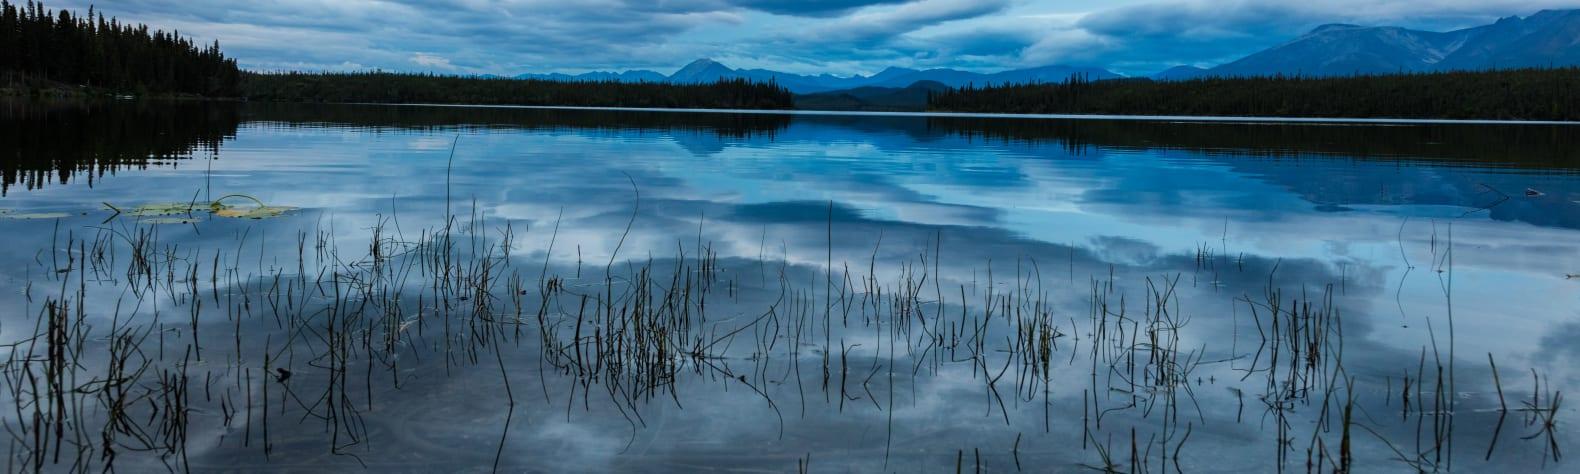 Wrangell-St Elias National Park and Preserve